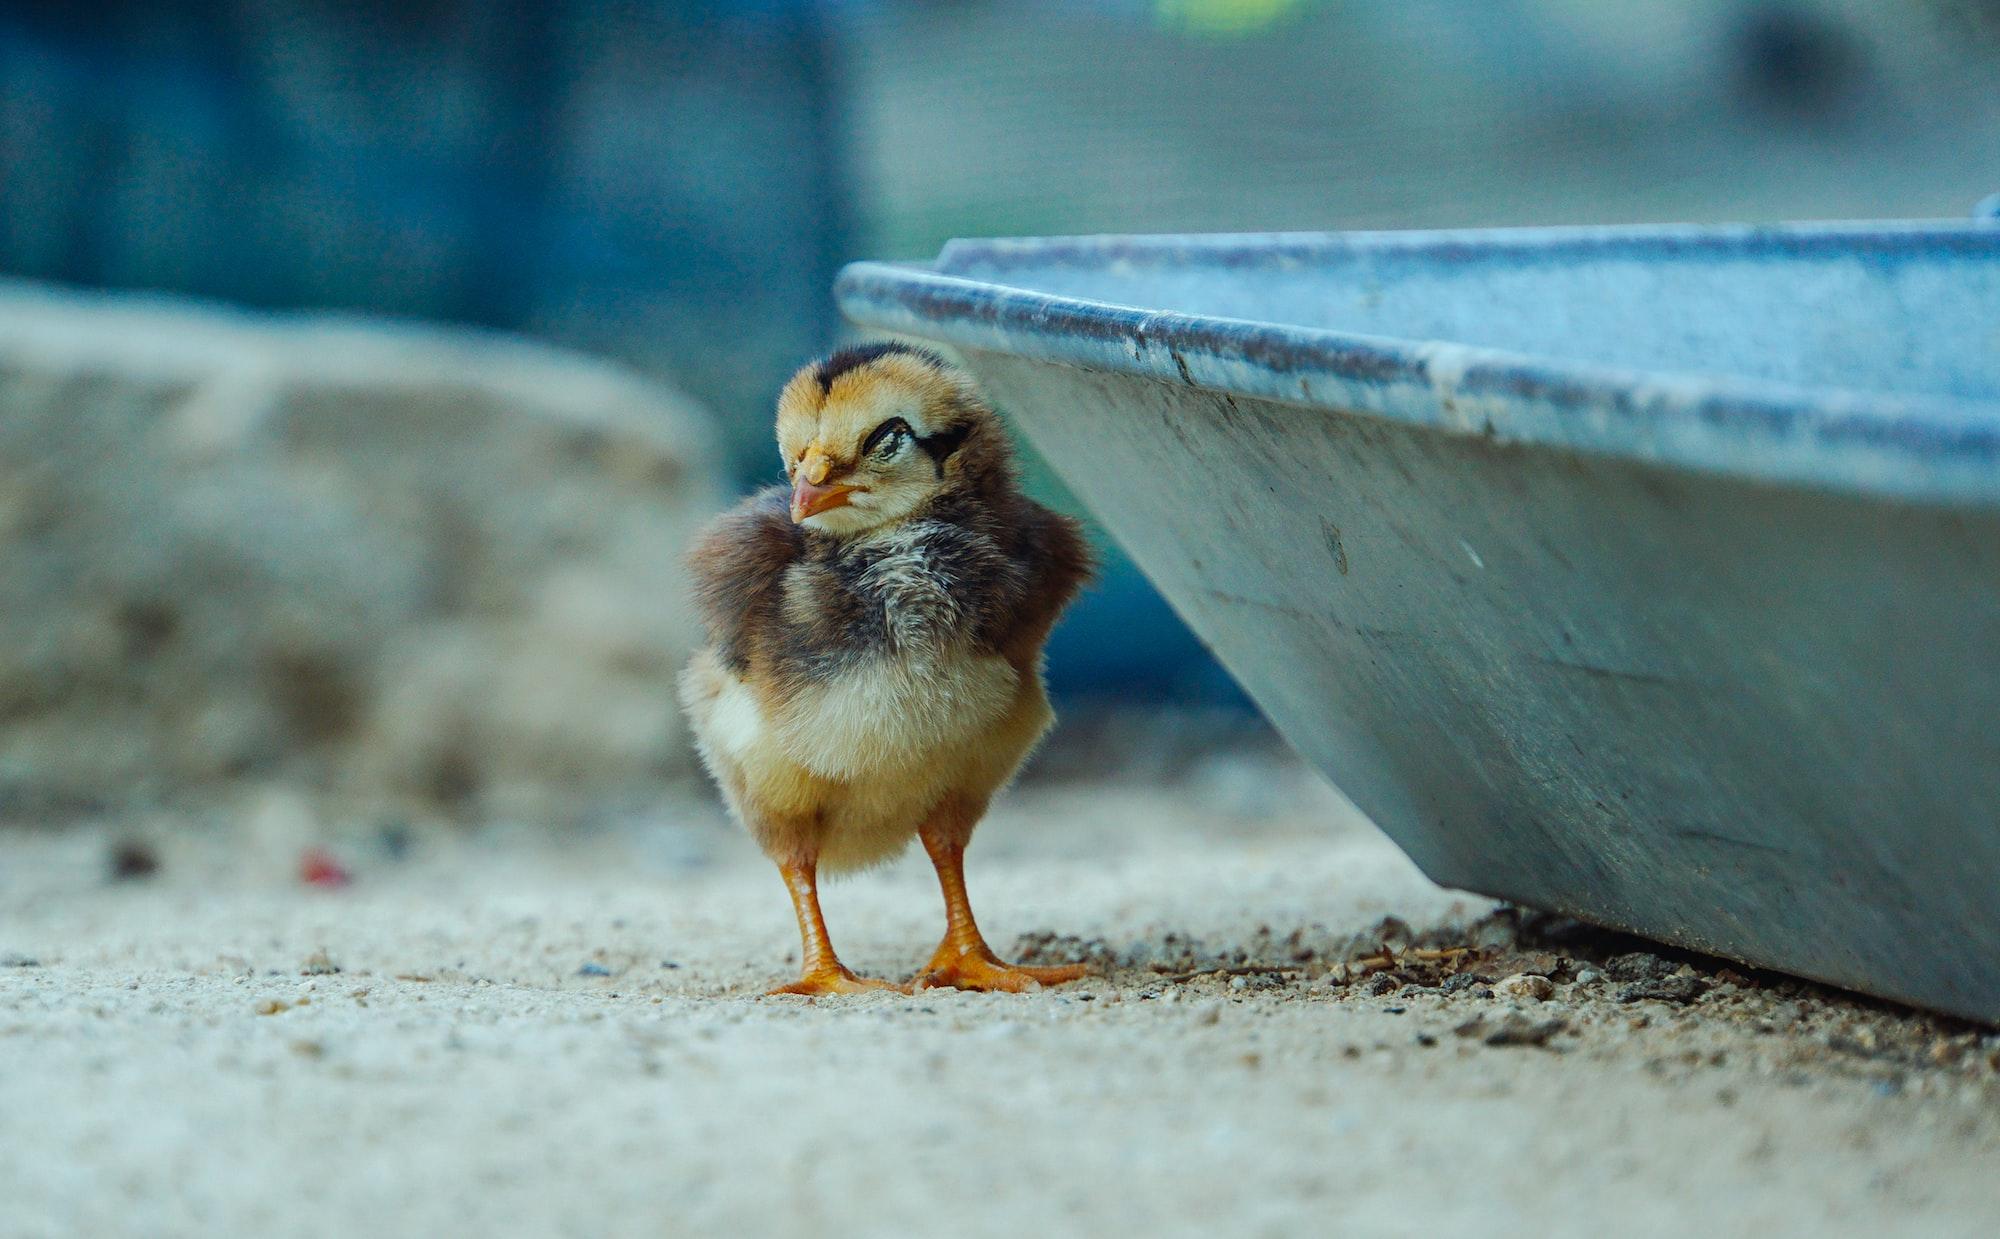 Hatched chicks